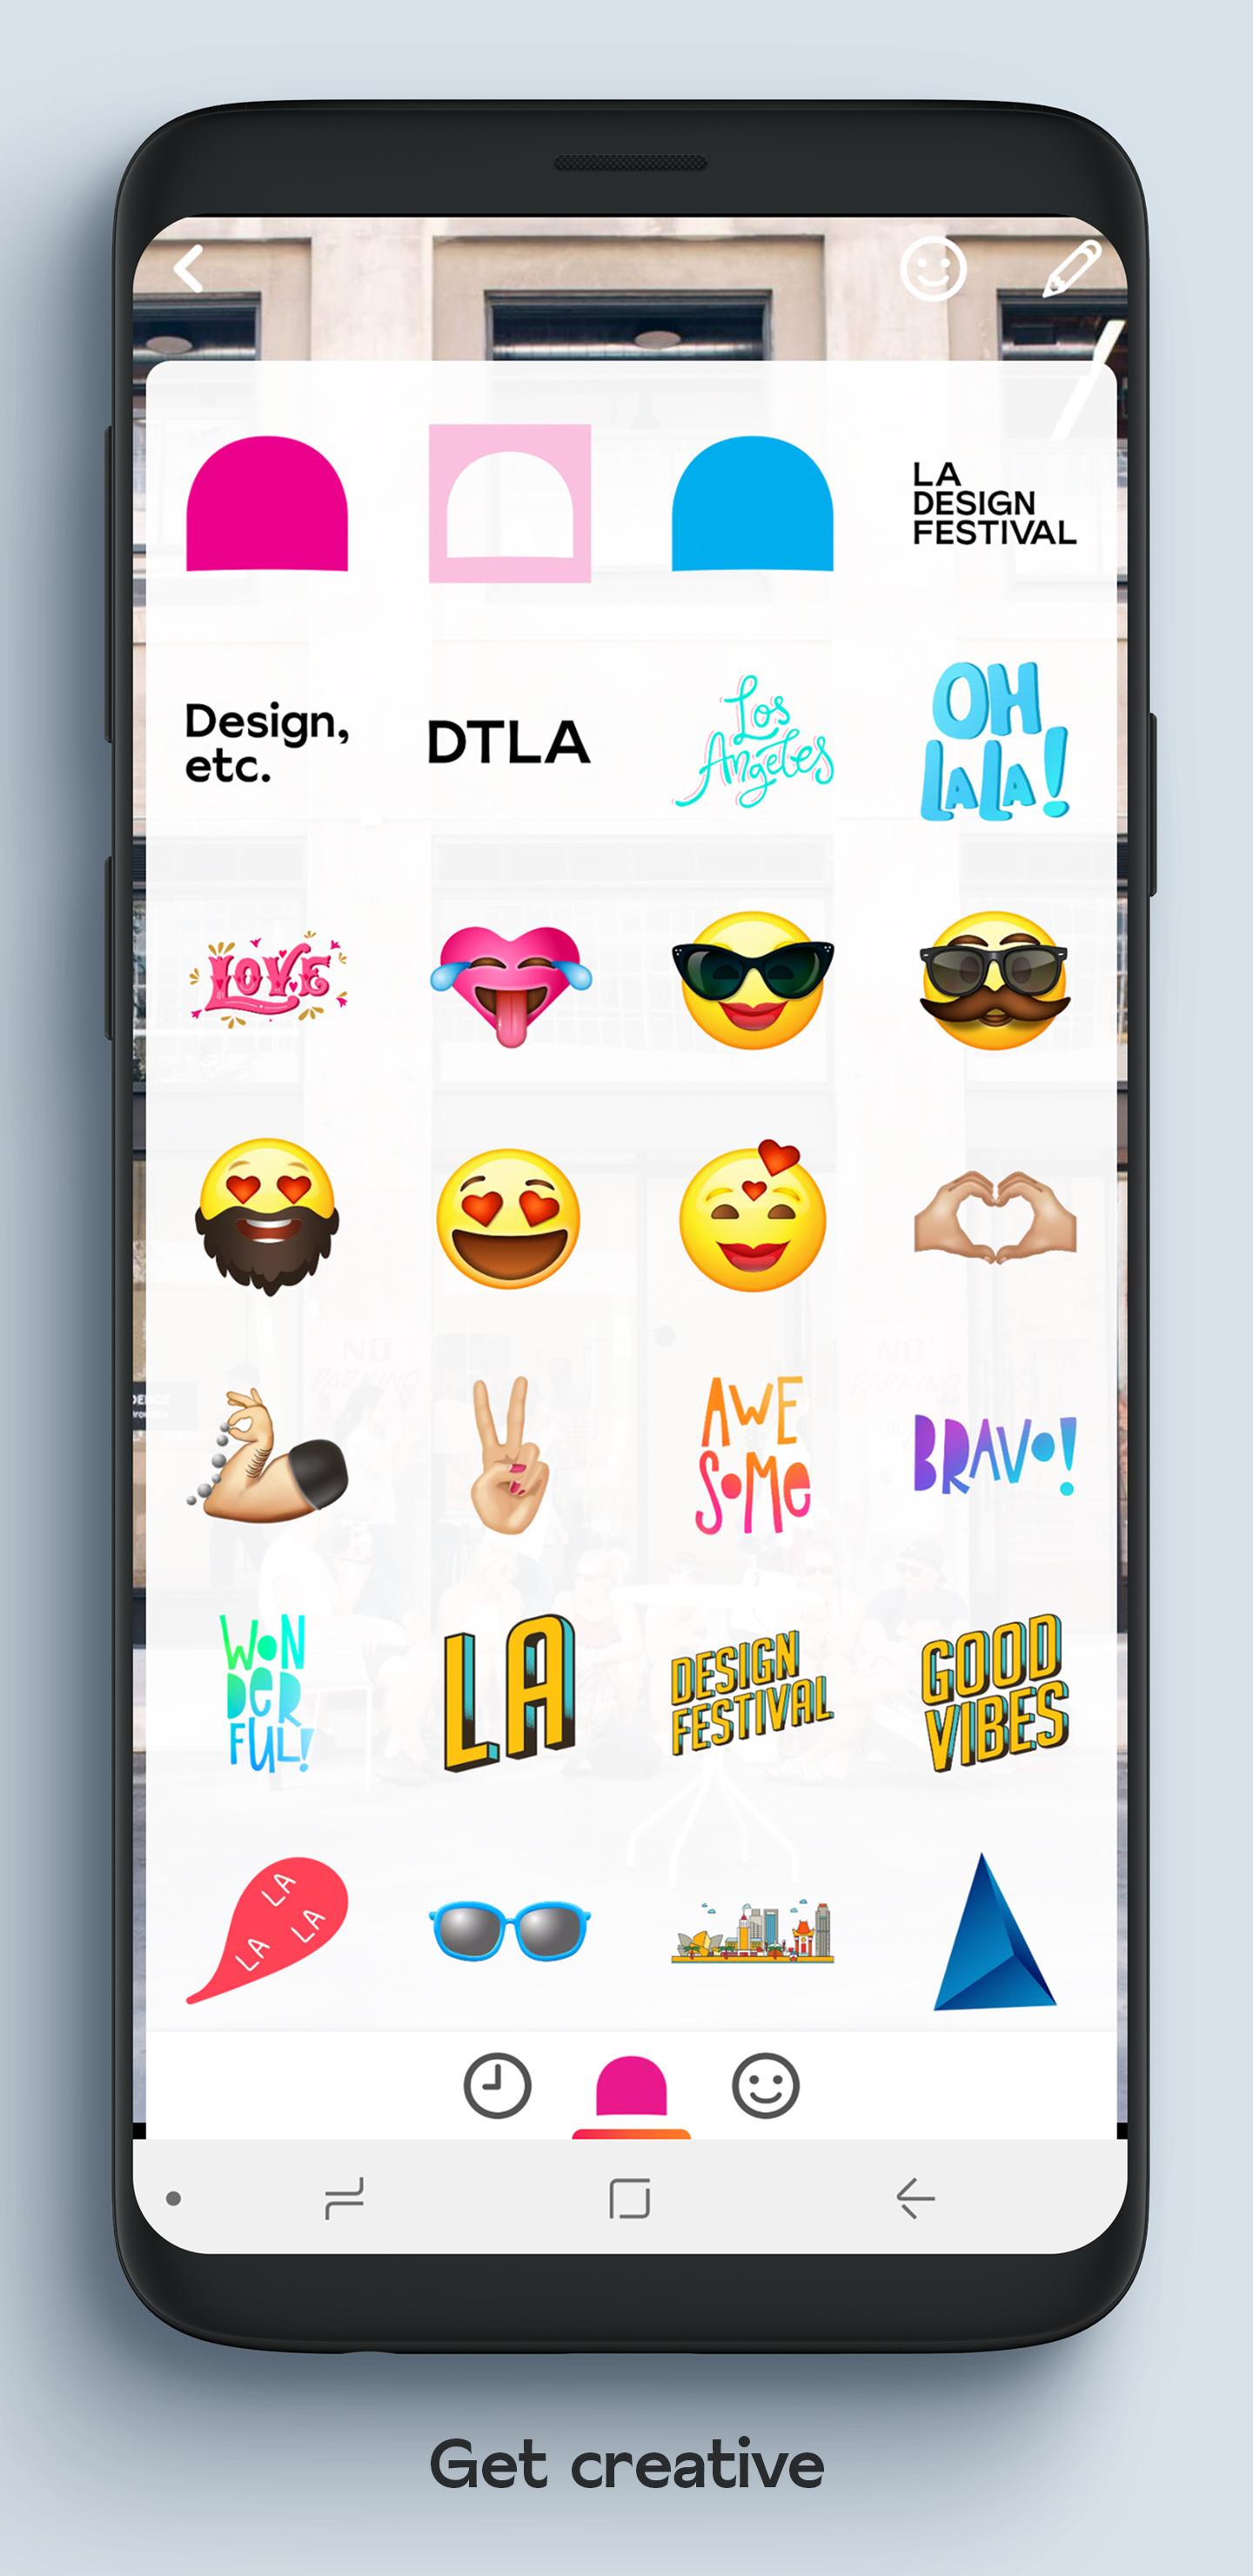 LA DESIGN FESTIVAL - Social Messaging and Stories App